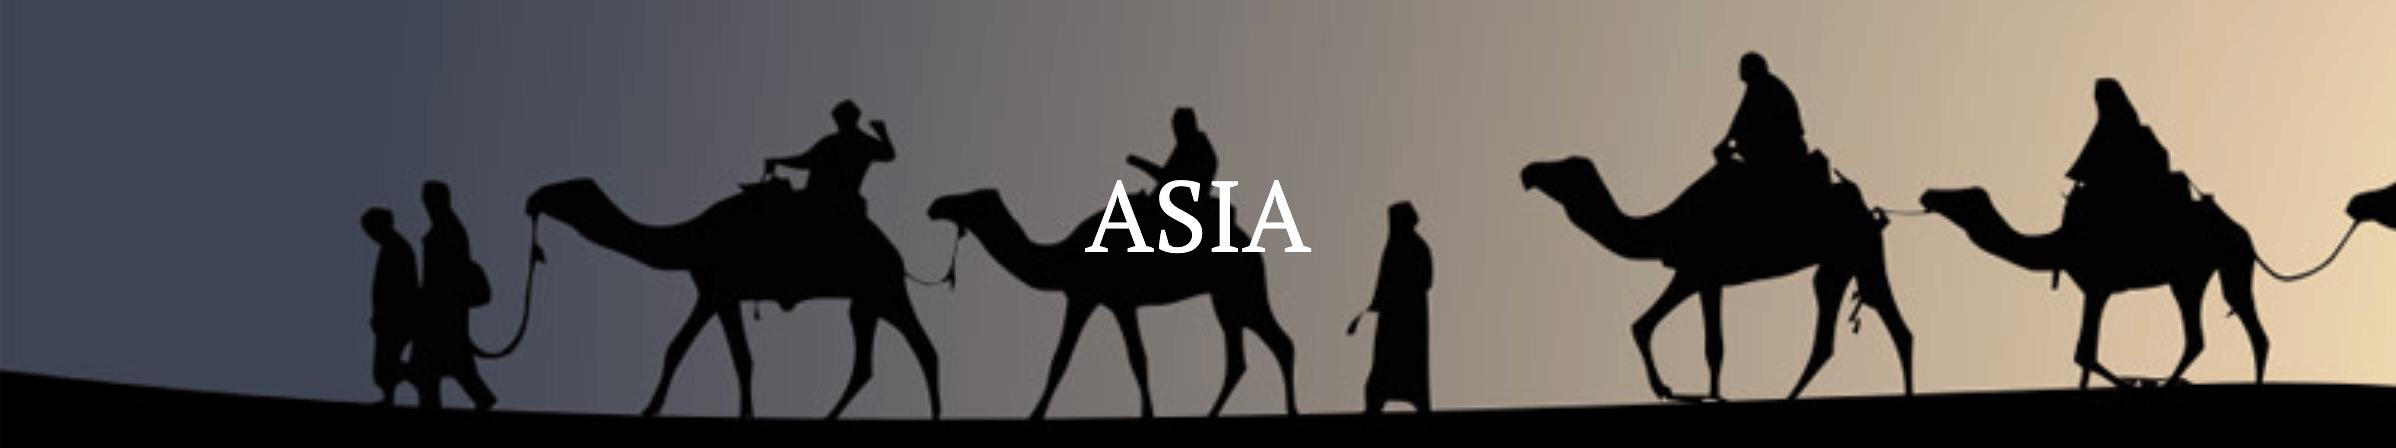 Asia destination